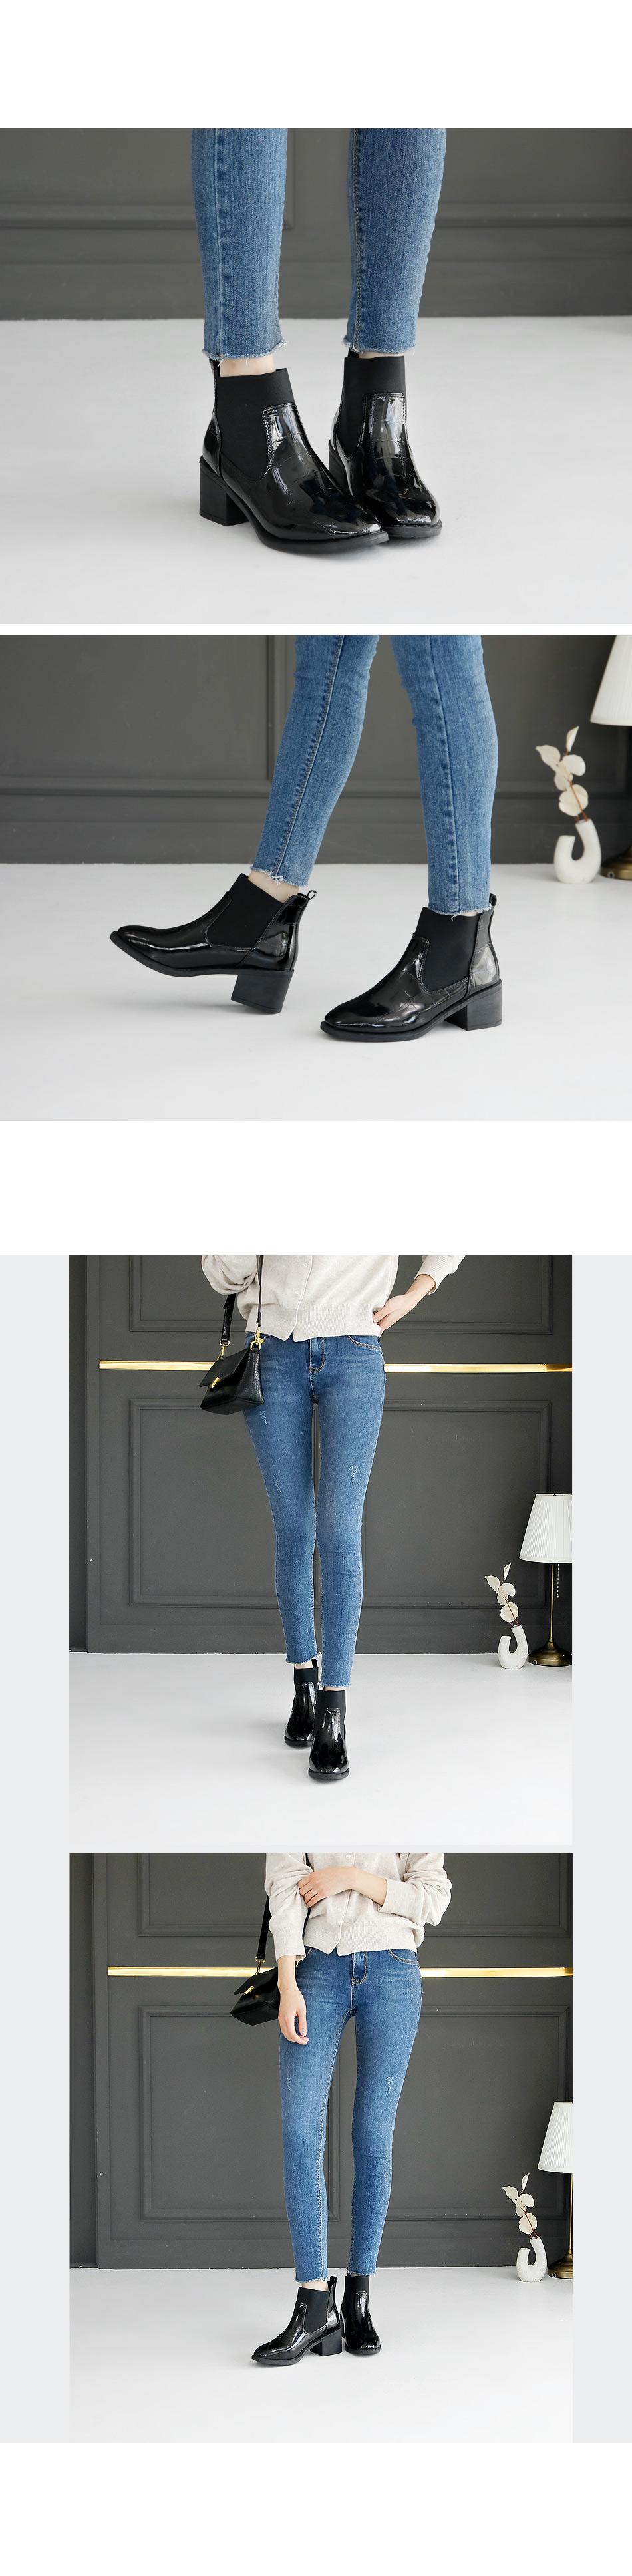 Lepets Chelsea Boots 6cm